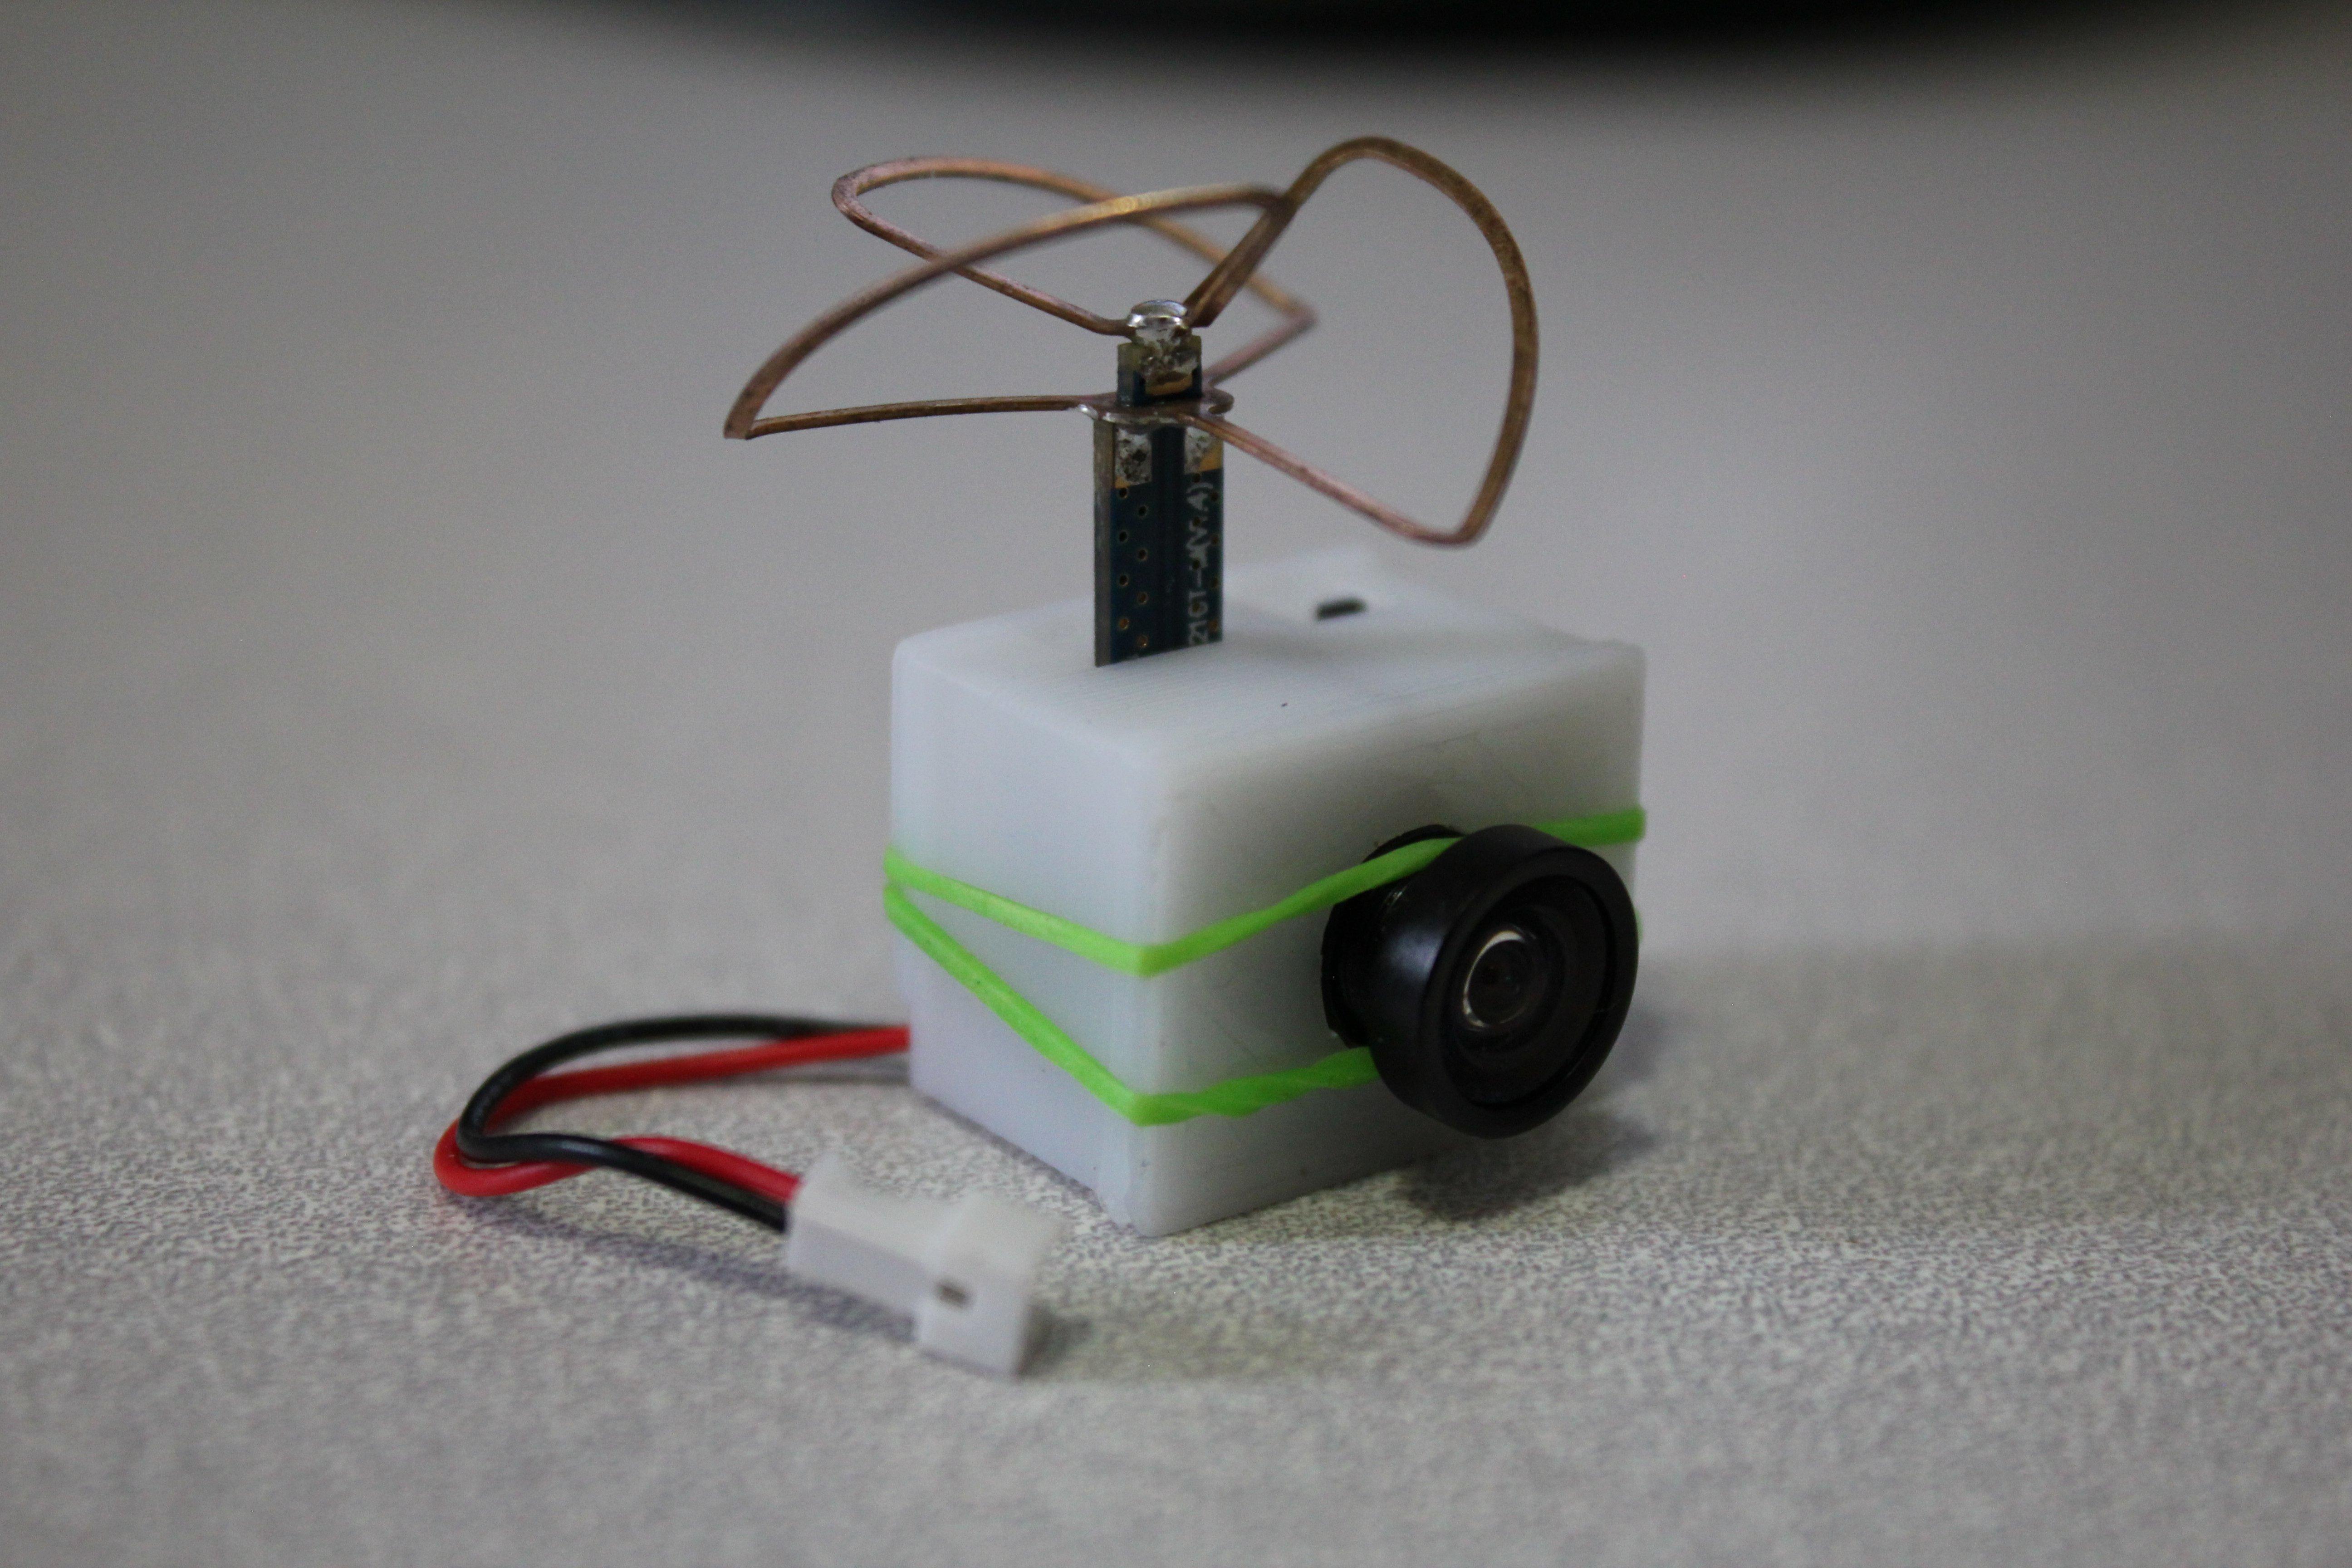 3D Printed micro fpv camera case by Morgan Hawkins | Pinshape